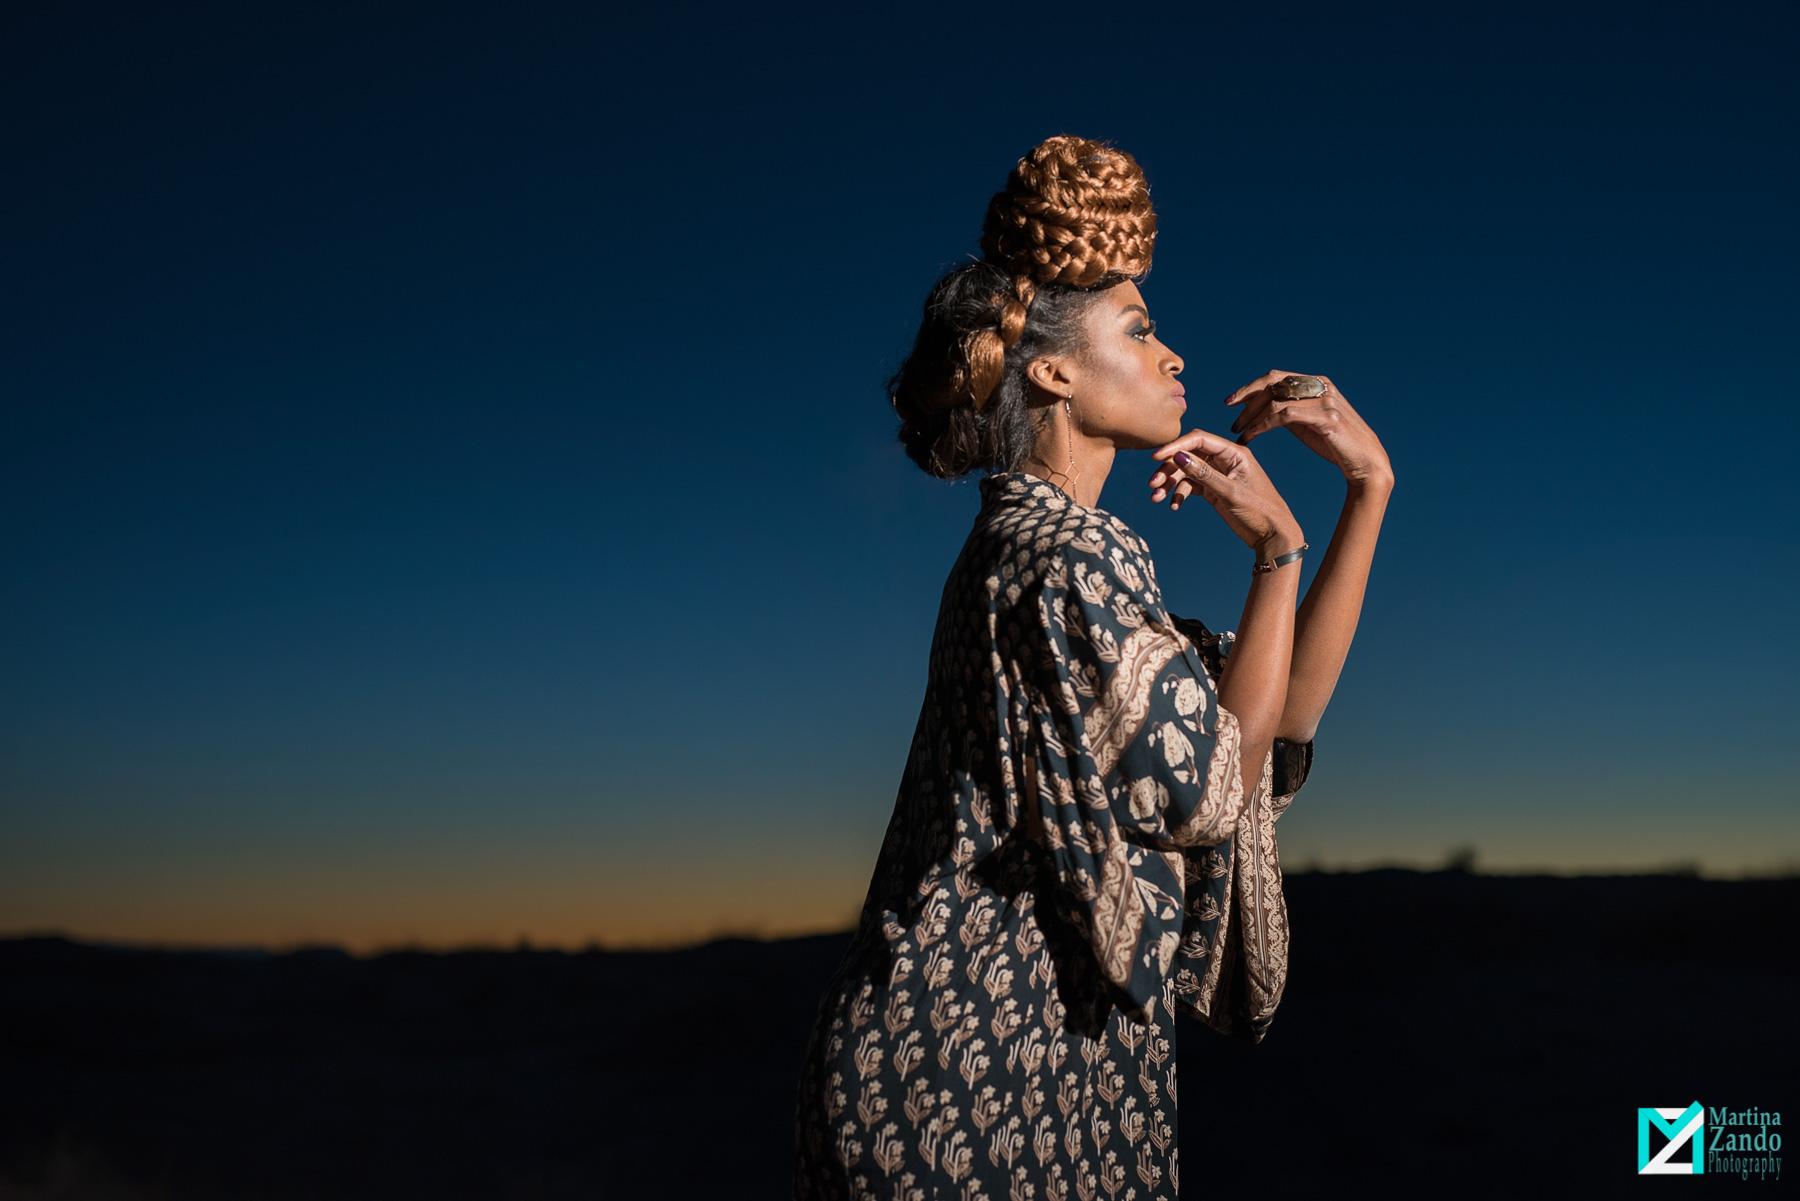 sunset desert fashion photo african american woman